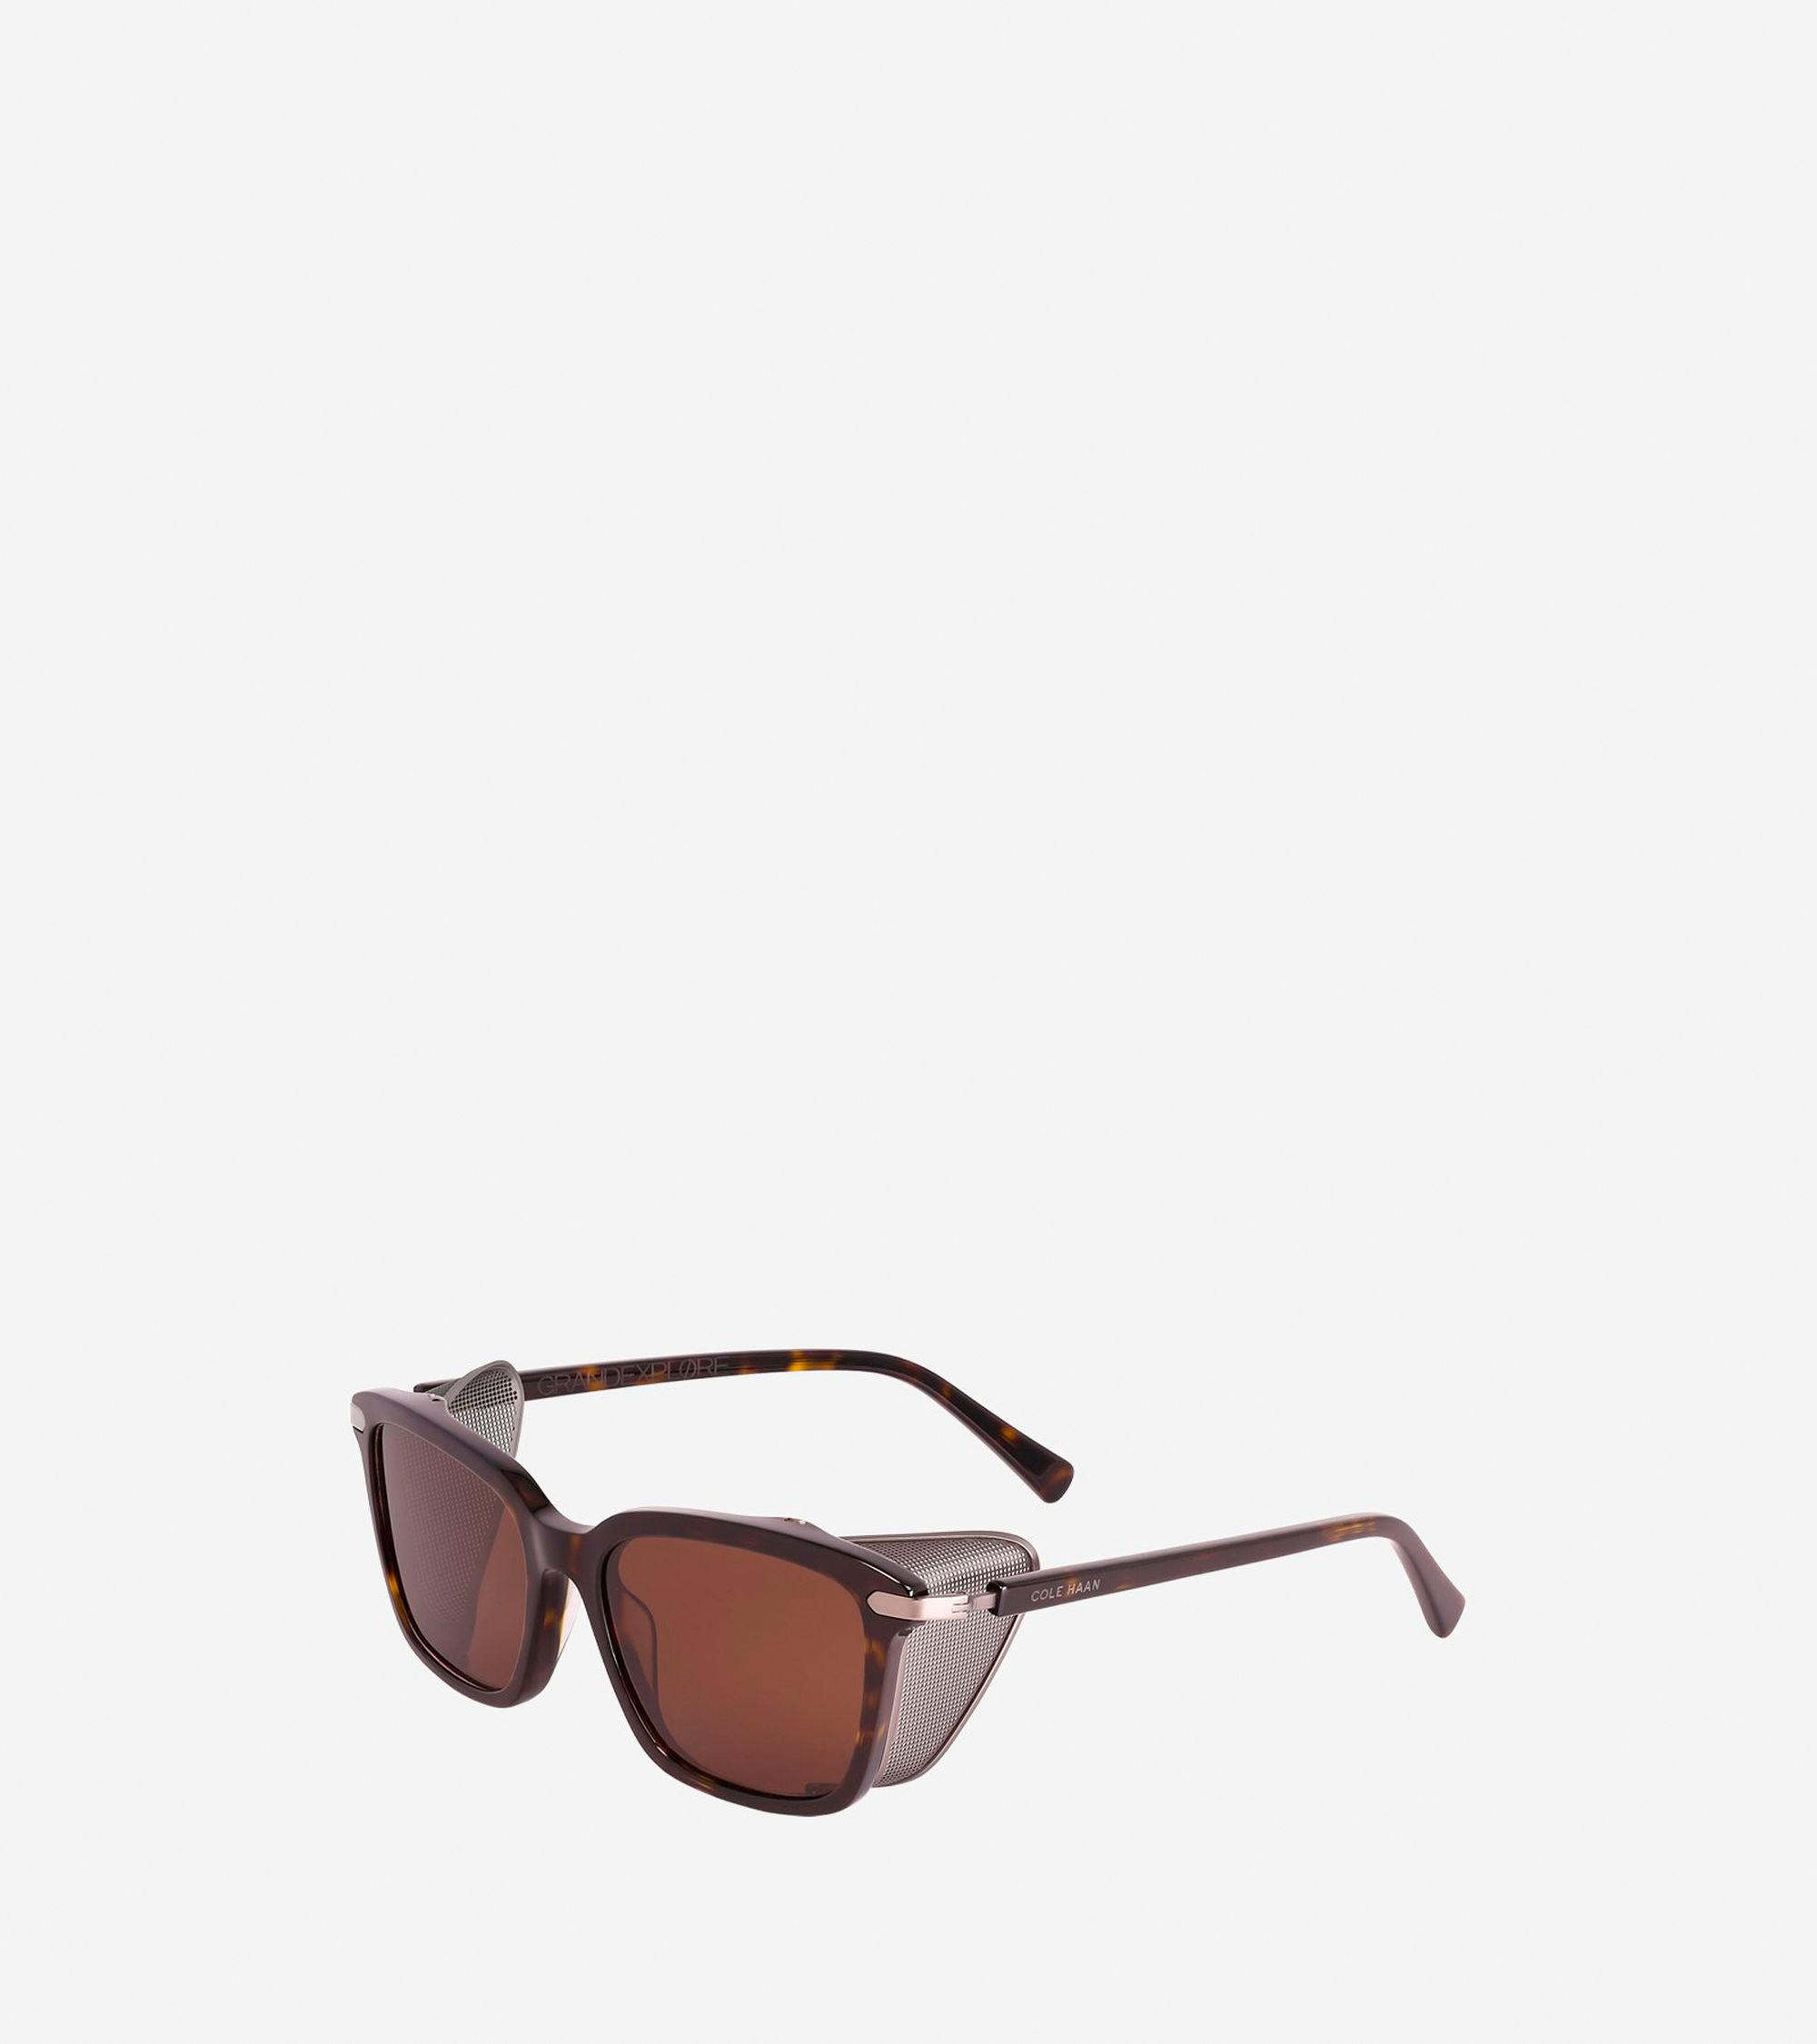 Lyst - Cole Haan Grandexpløre Glacier Frame Sunglasses in Brown for Men